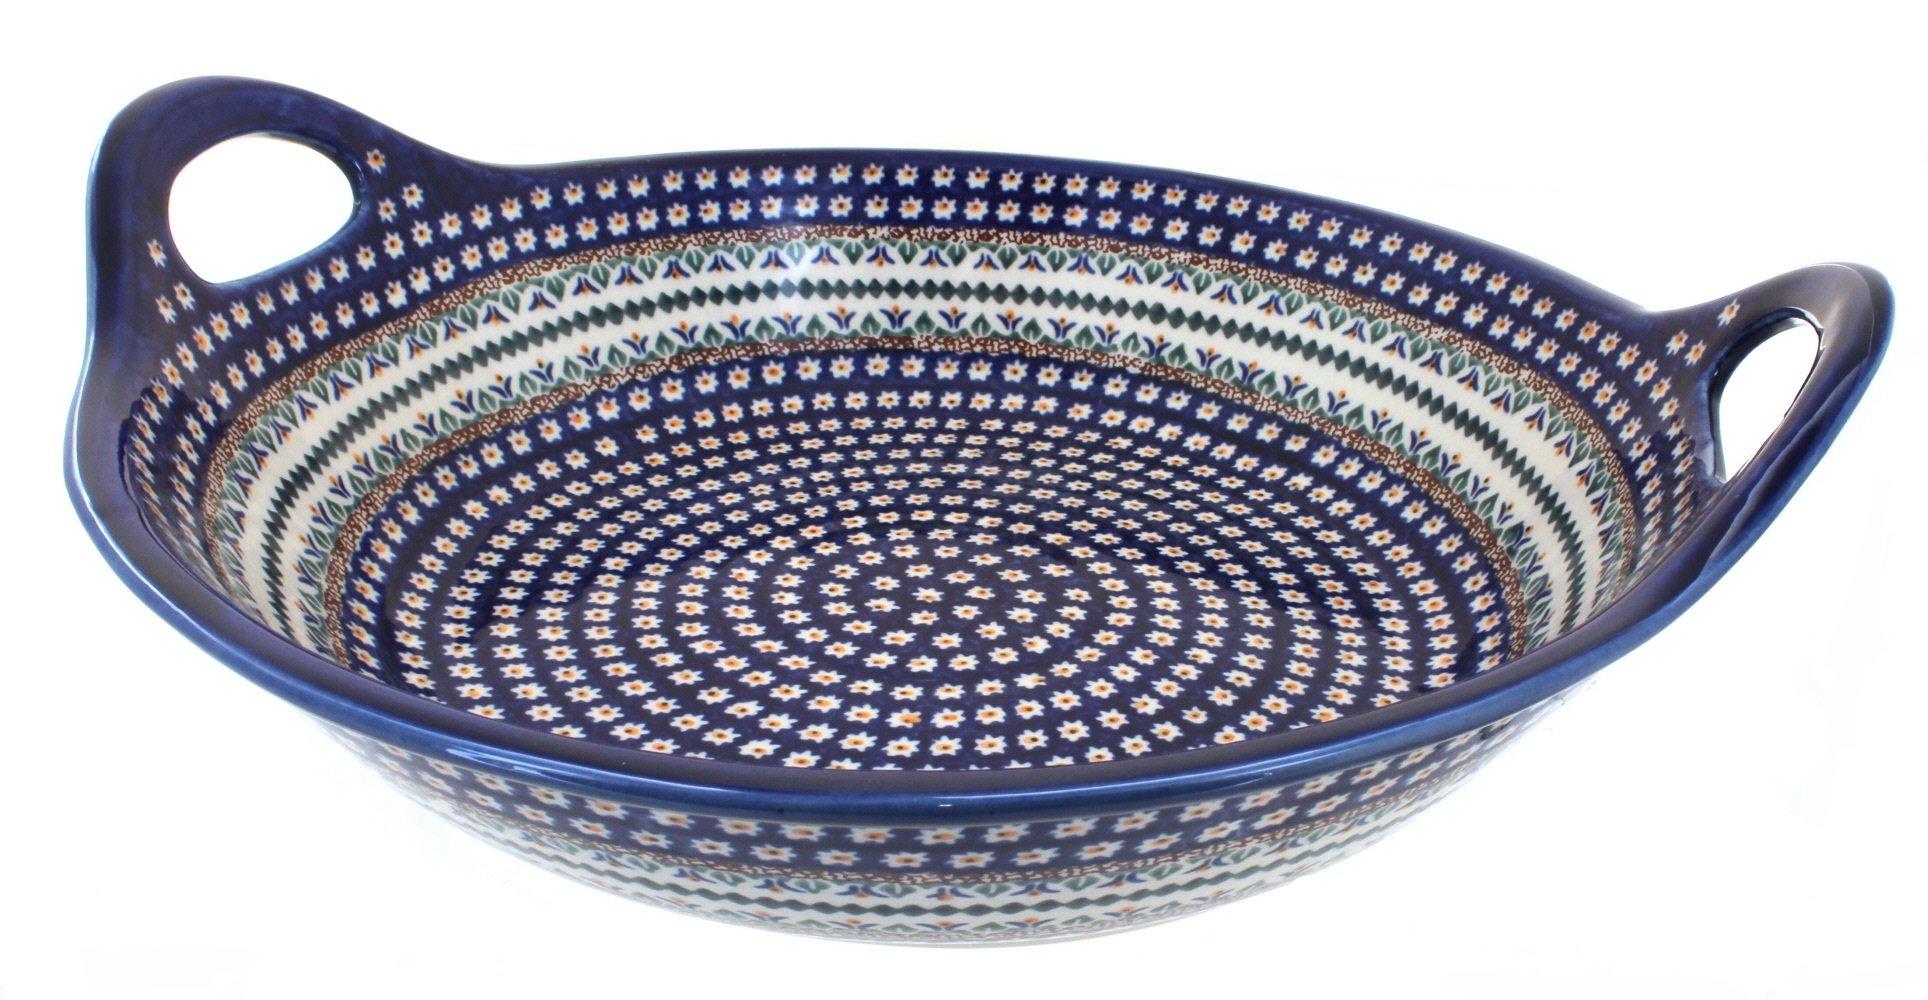 Polish Pottery Daisy Large Deep Bowl with Handles